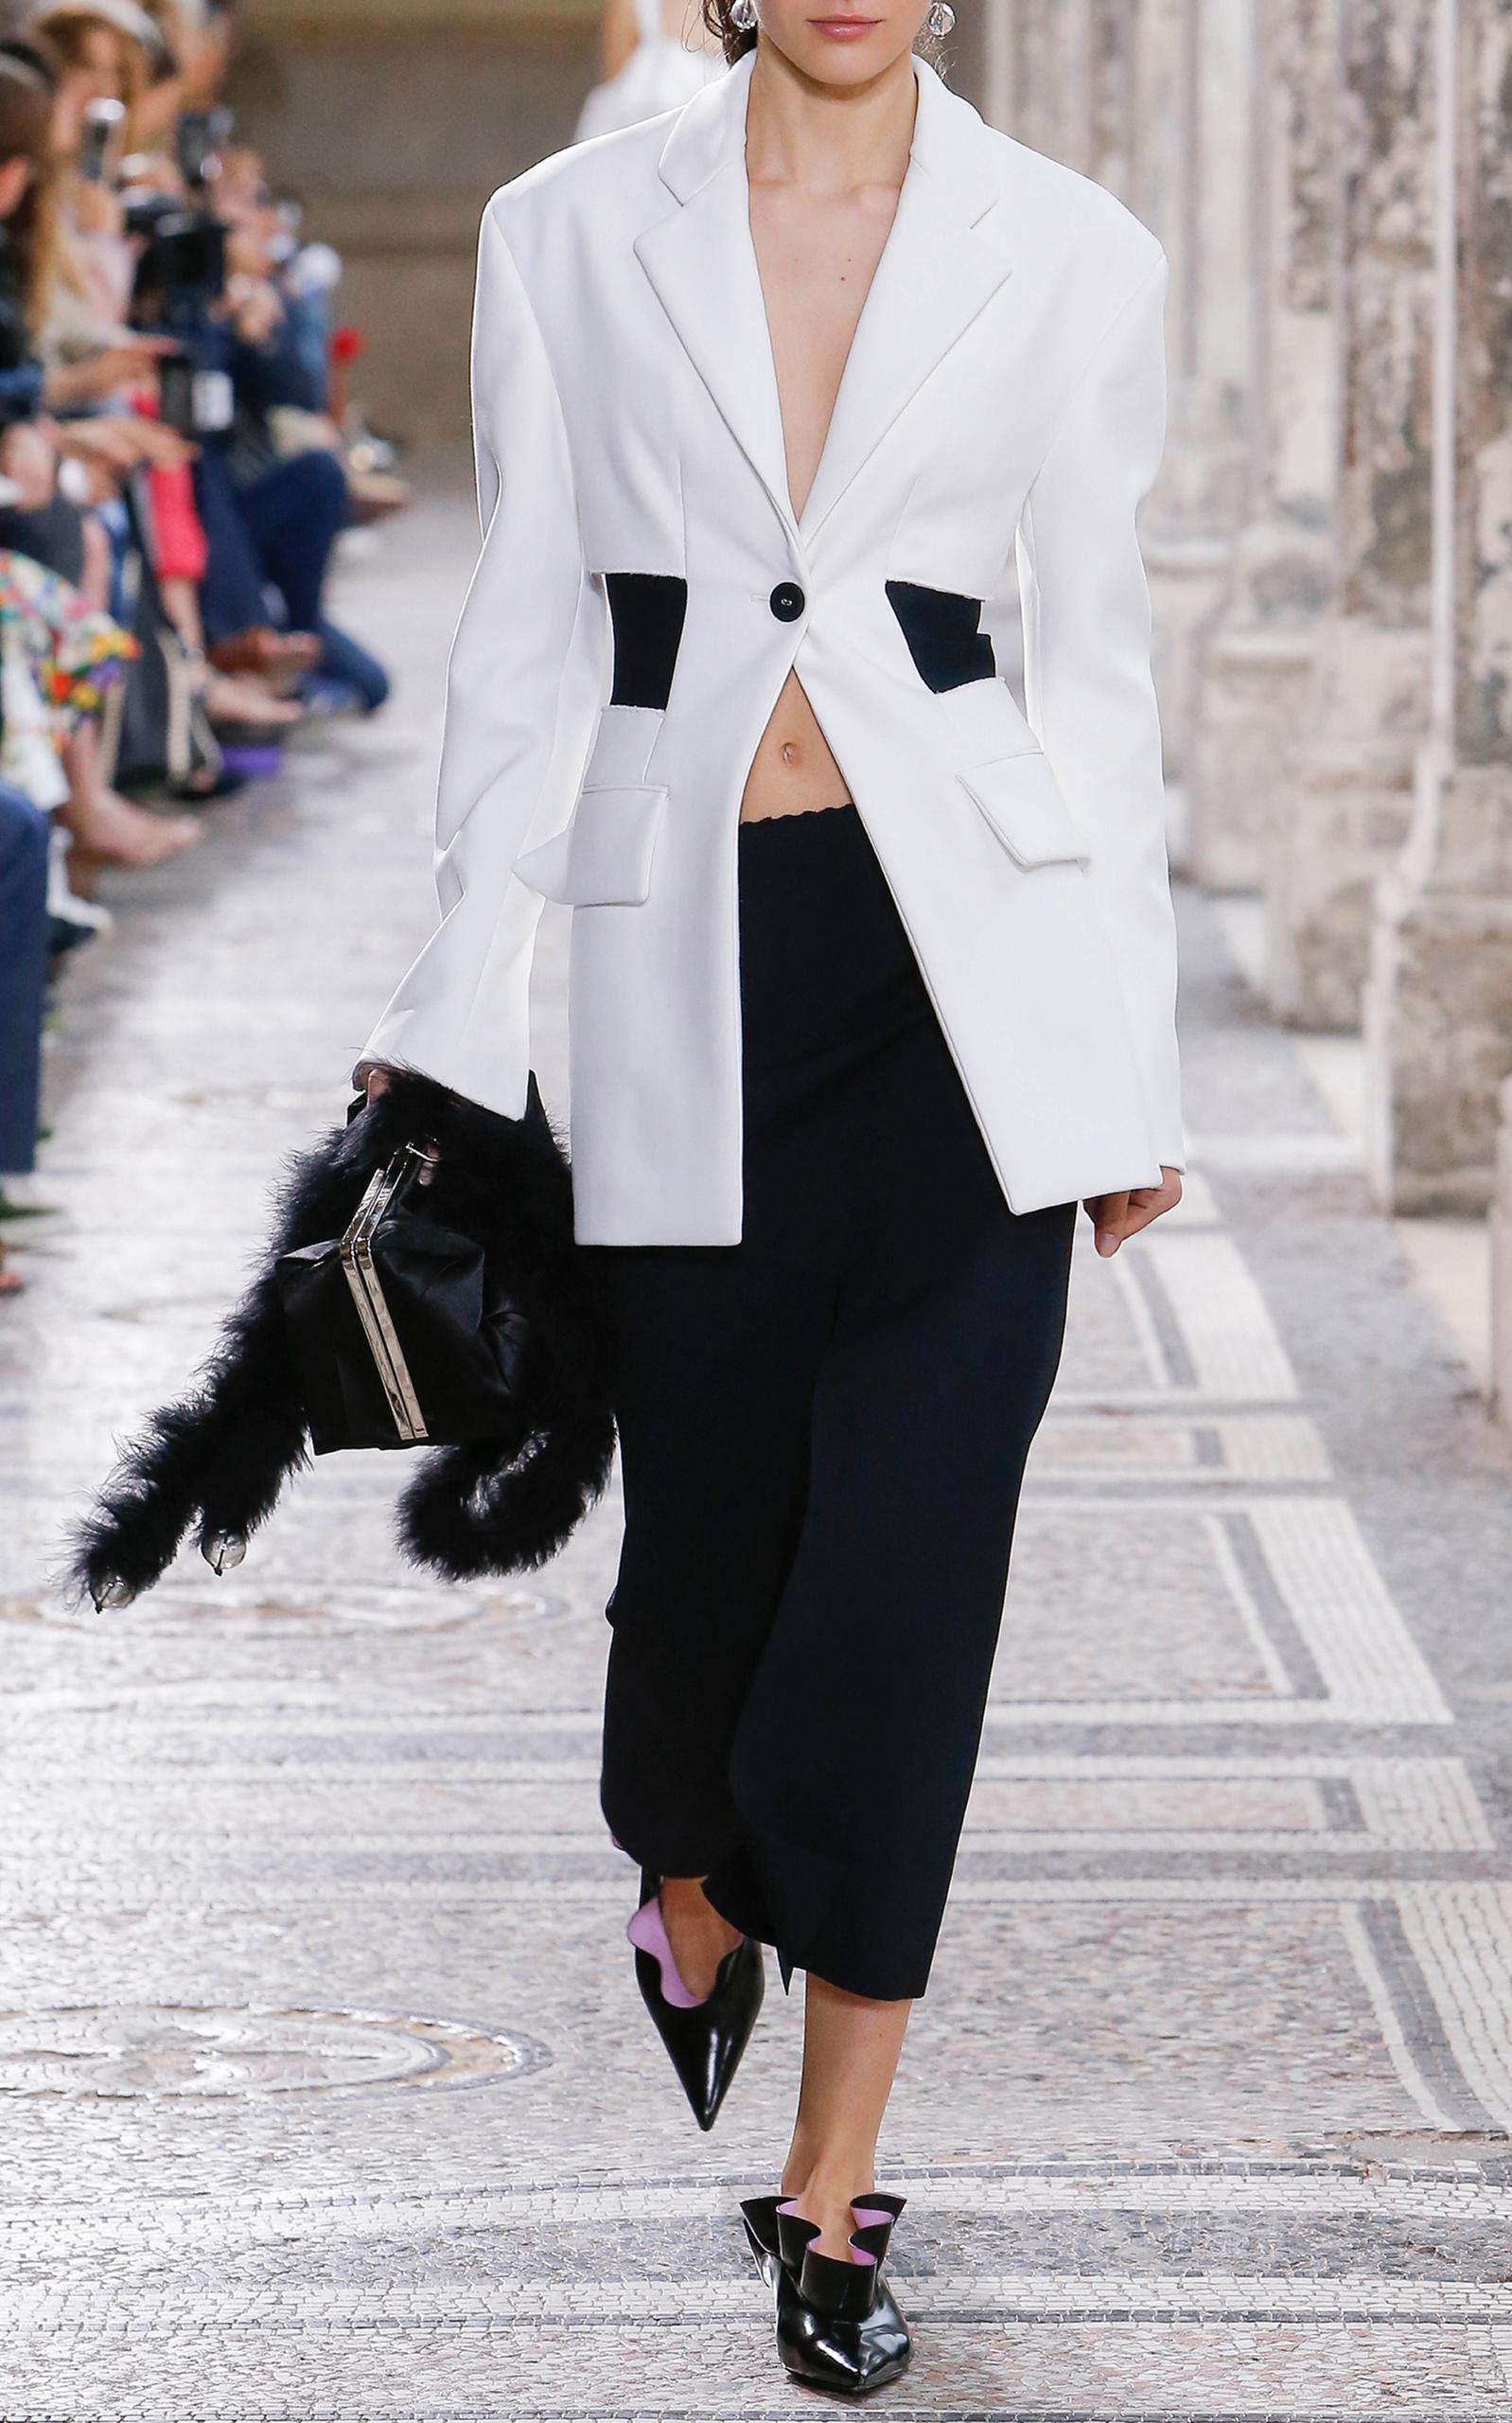 1aab162b9 Knit Pencil Skirt by Proenza Schouler | Moda Operandi